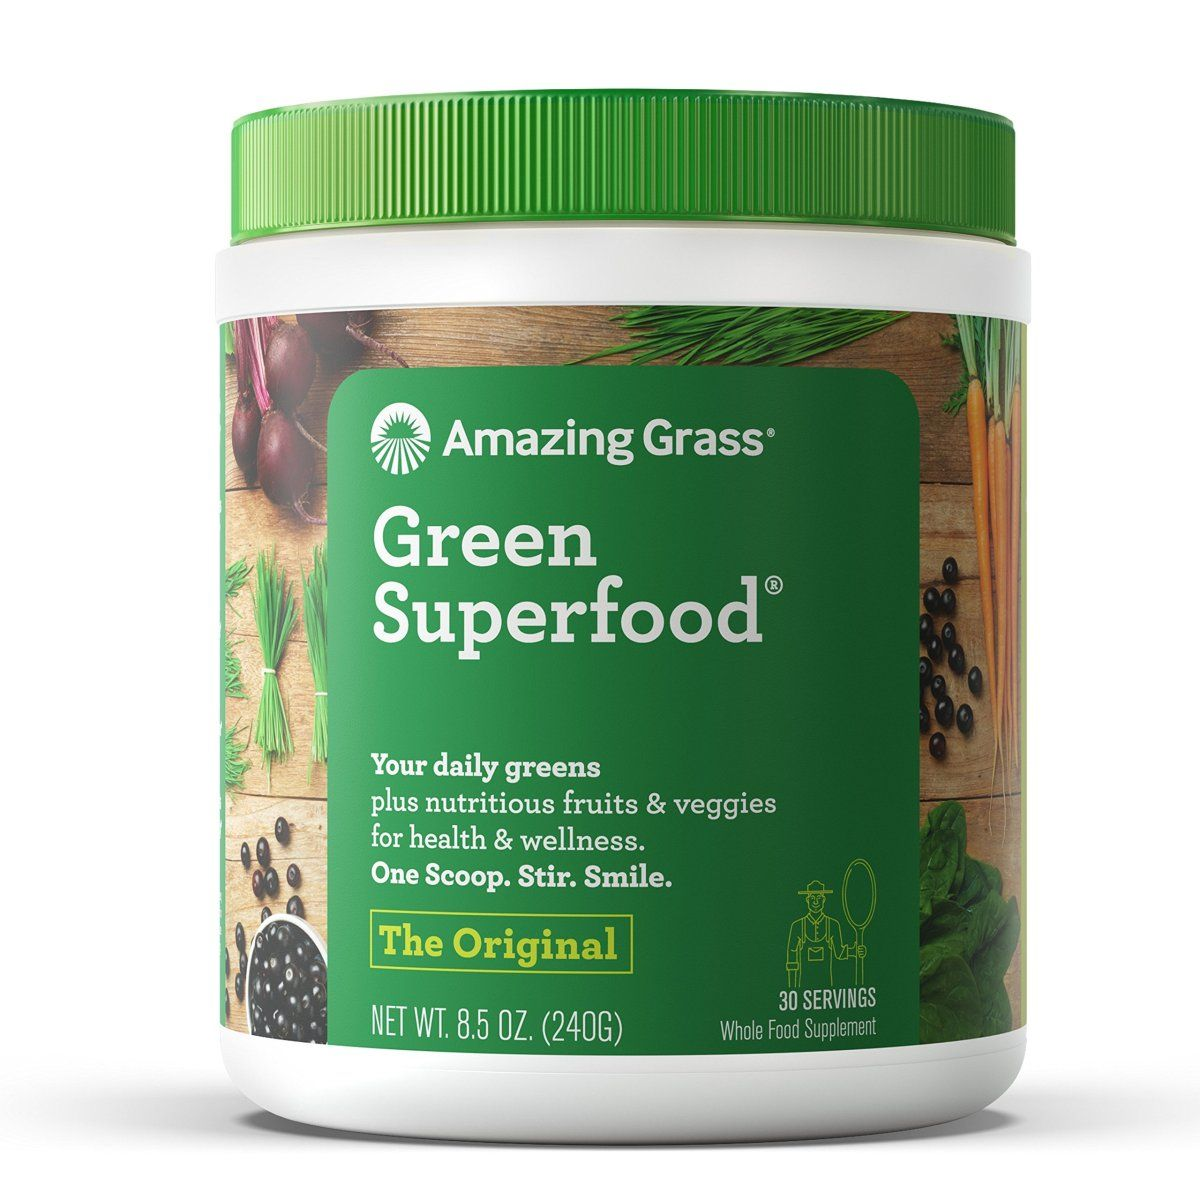 Amazing grass green superfood organic powder with wheat